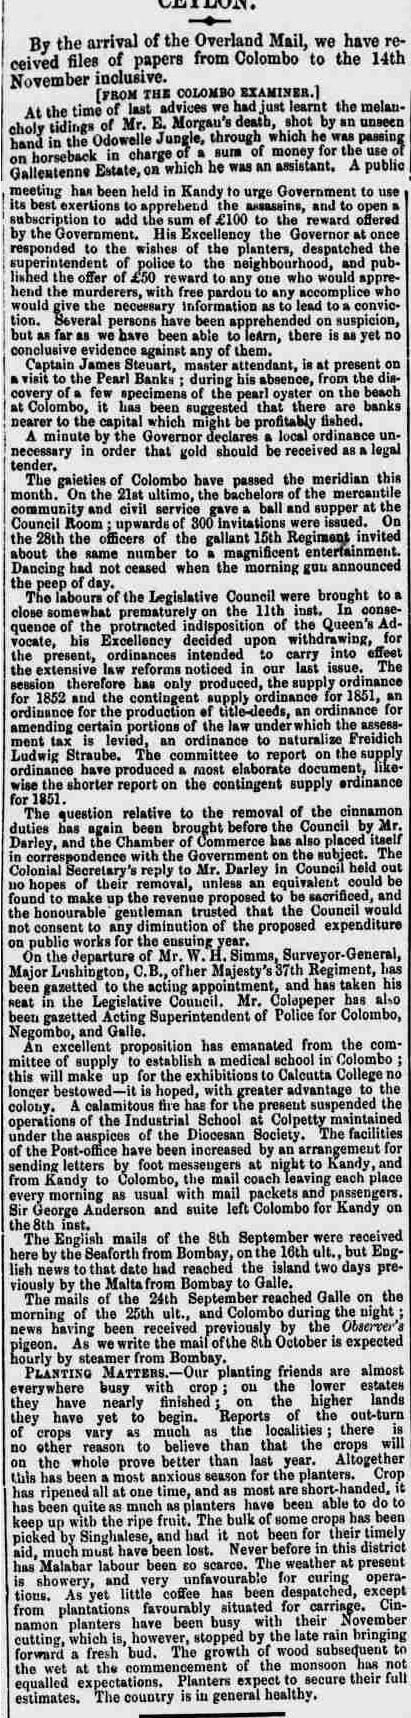 115. Ceylon News